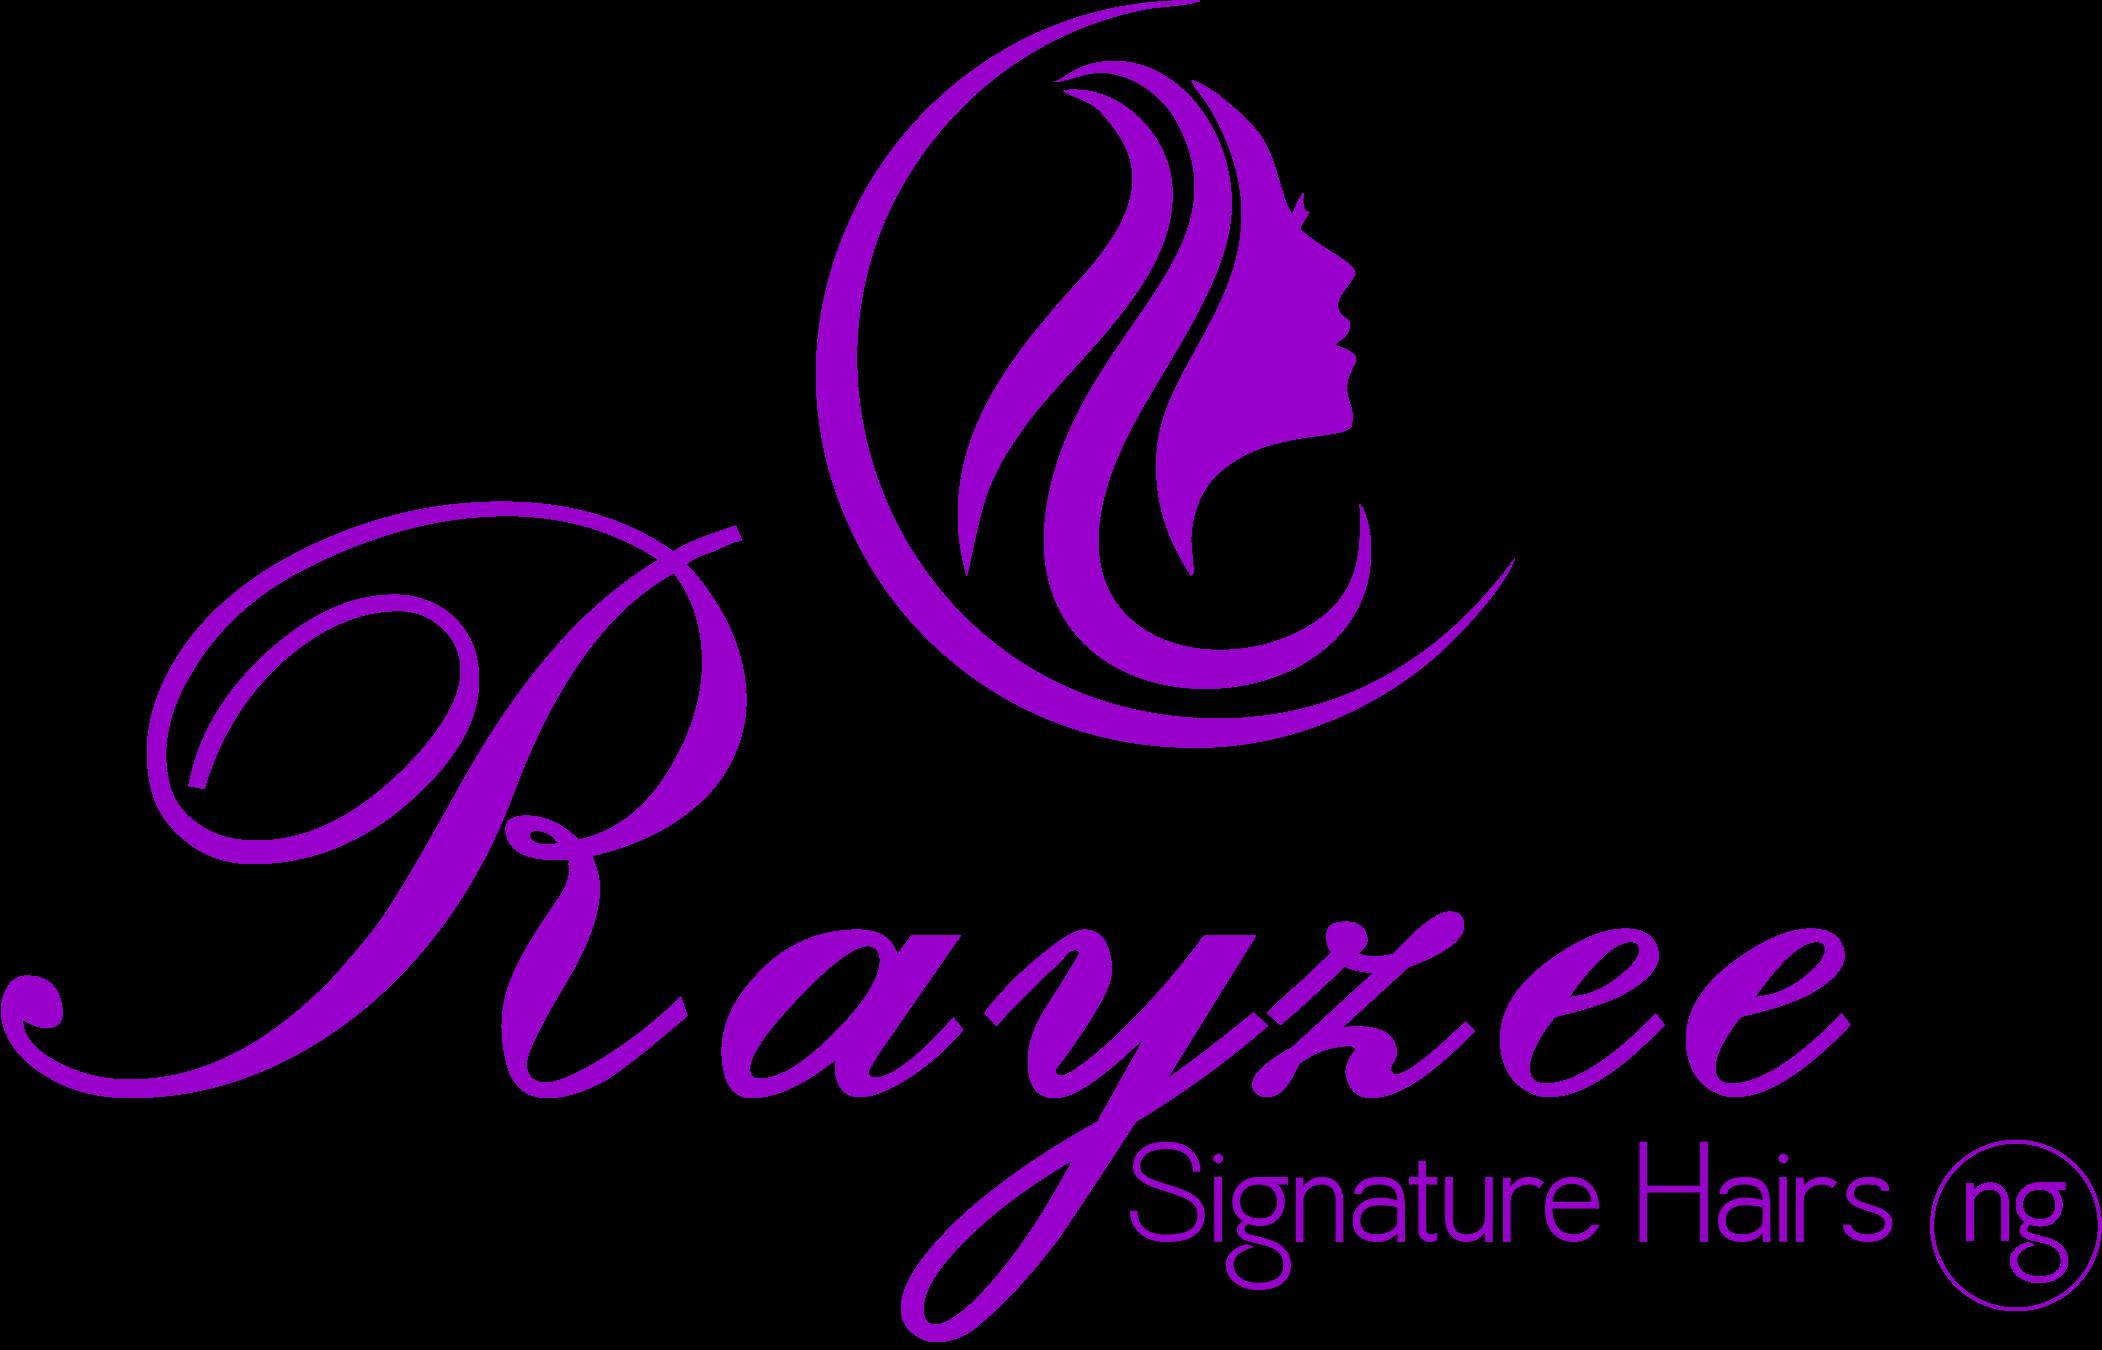 Rayzee Signature Hairs